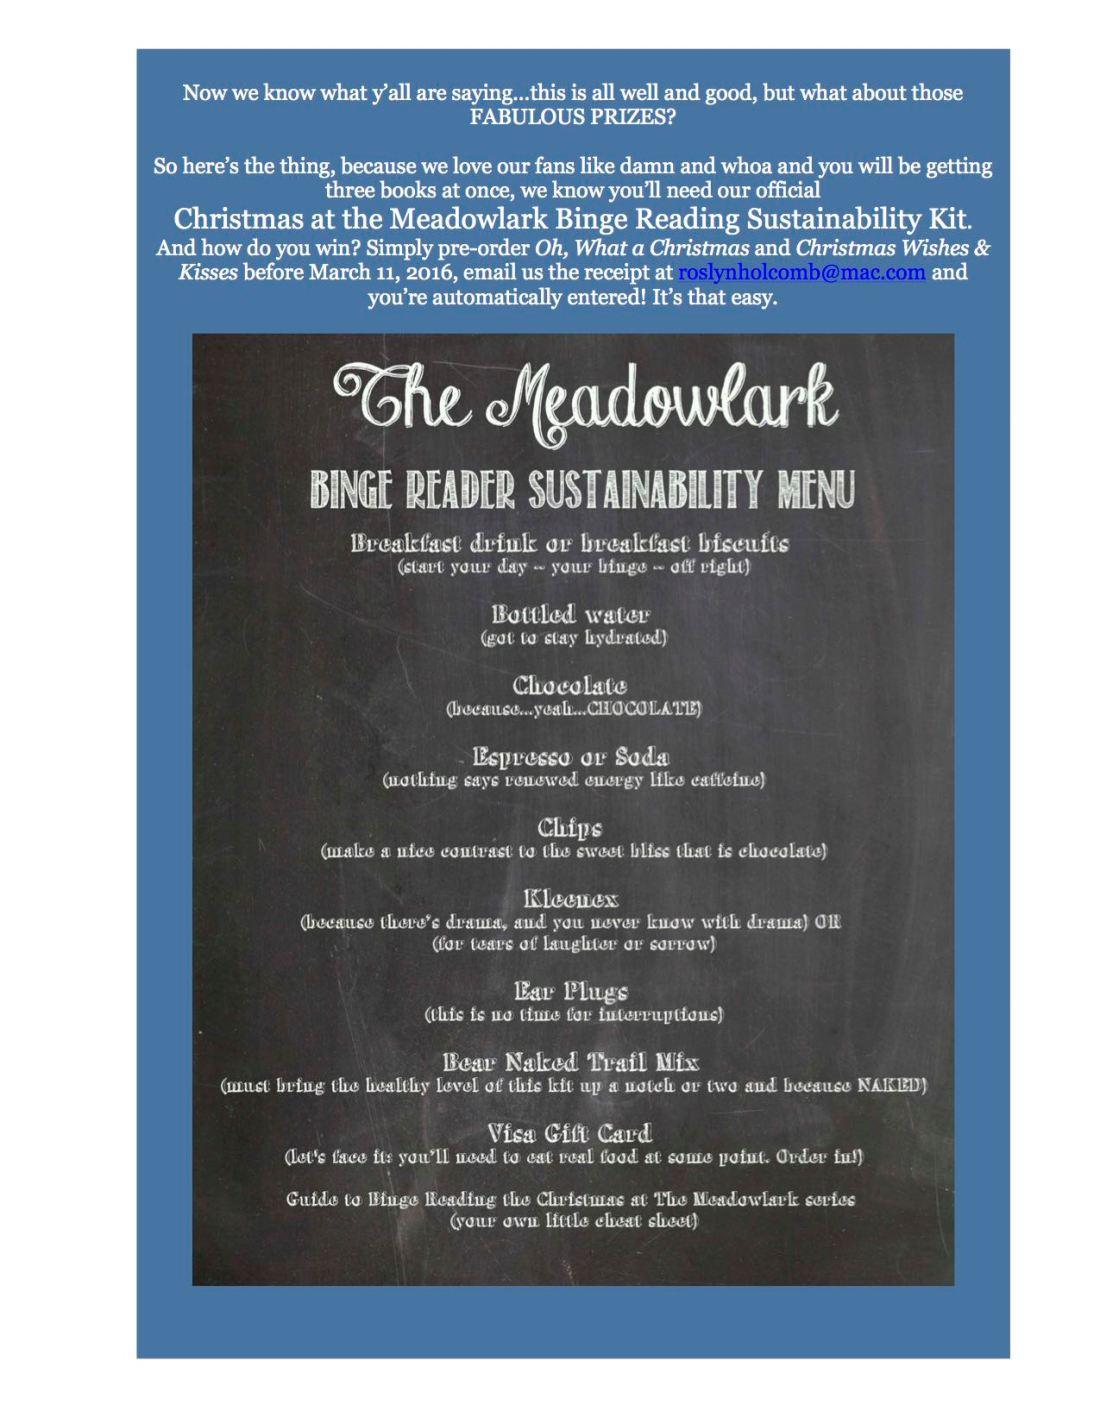 Meadowlark Promo RHH 2